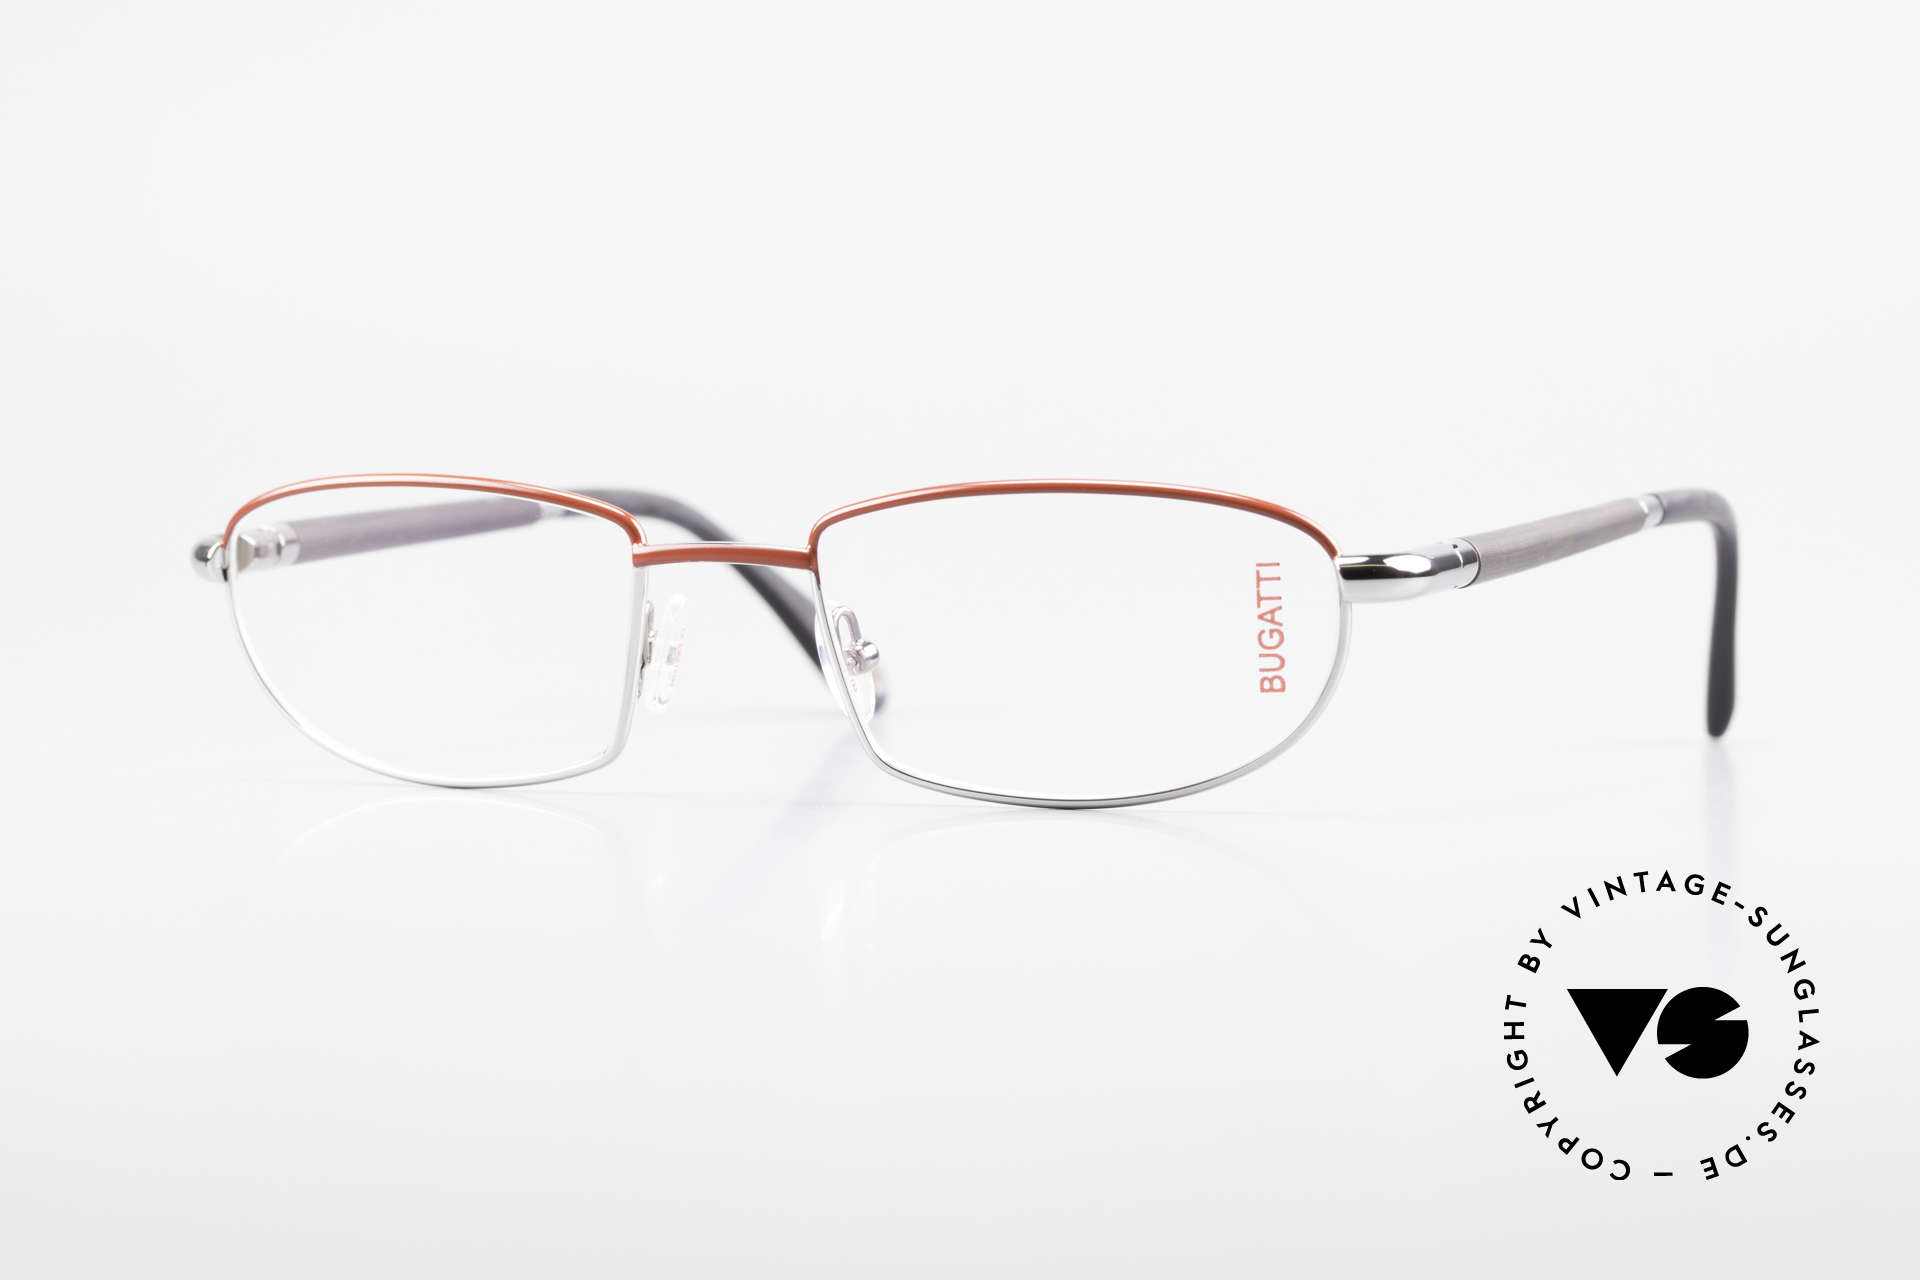 Bugatti 537 Genuine Horn Frame Palladium, luxury eyeglasses by BUGATTI, TOP-NOTCH quality, Made for Men